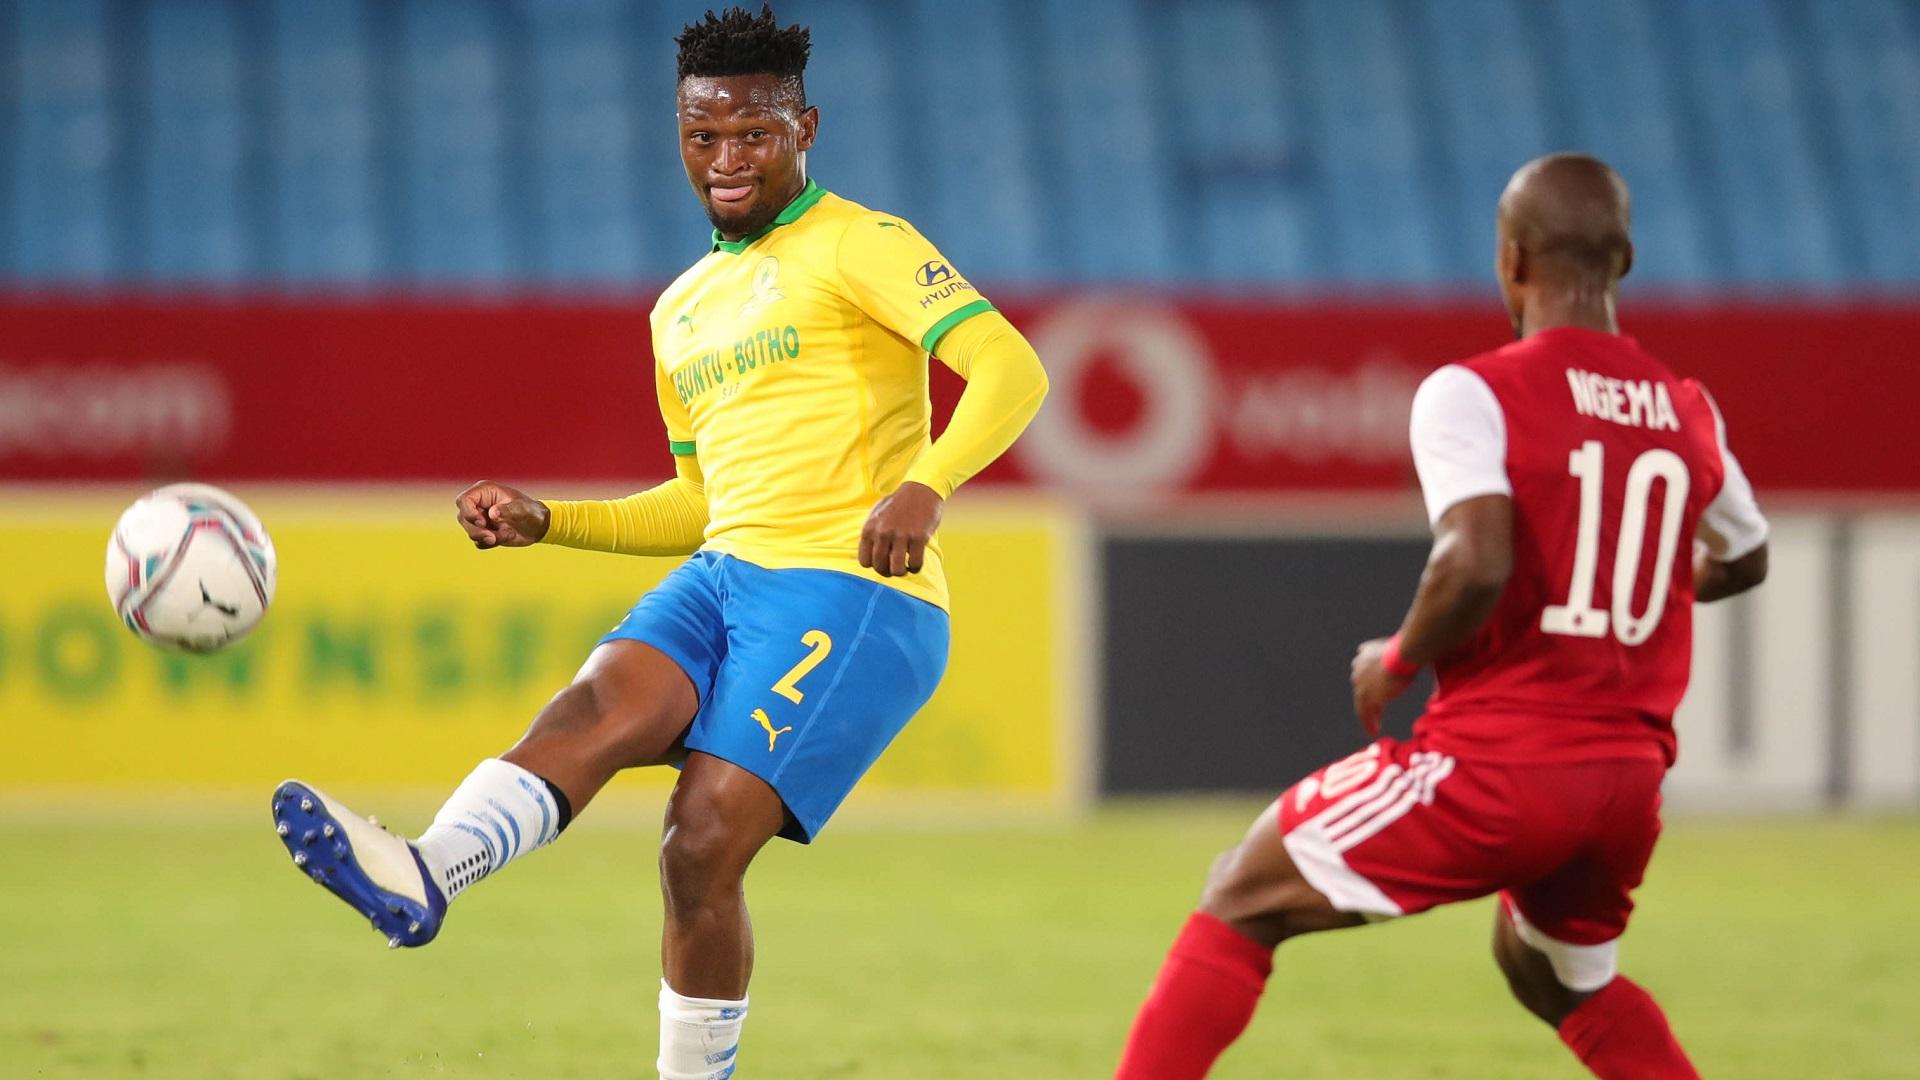 DStv Premiership | Mamelodi Sundowns v Tshakhuma FC | Highlights